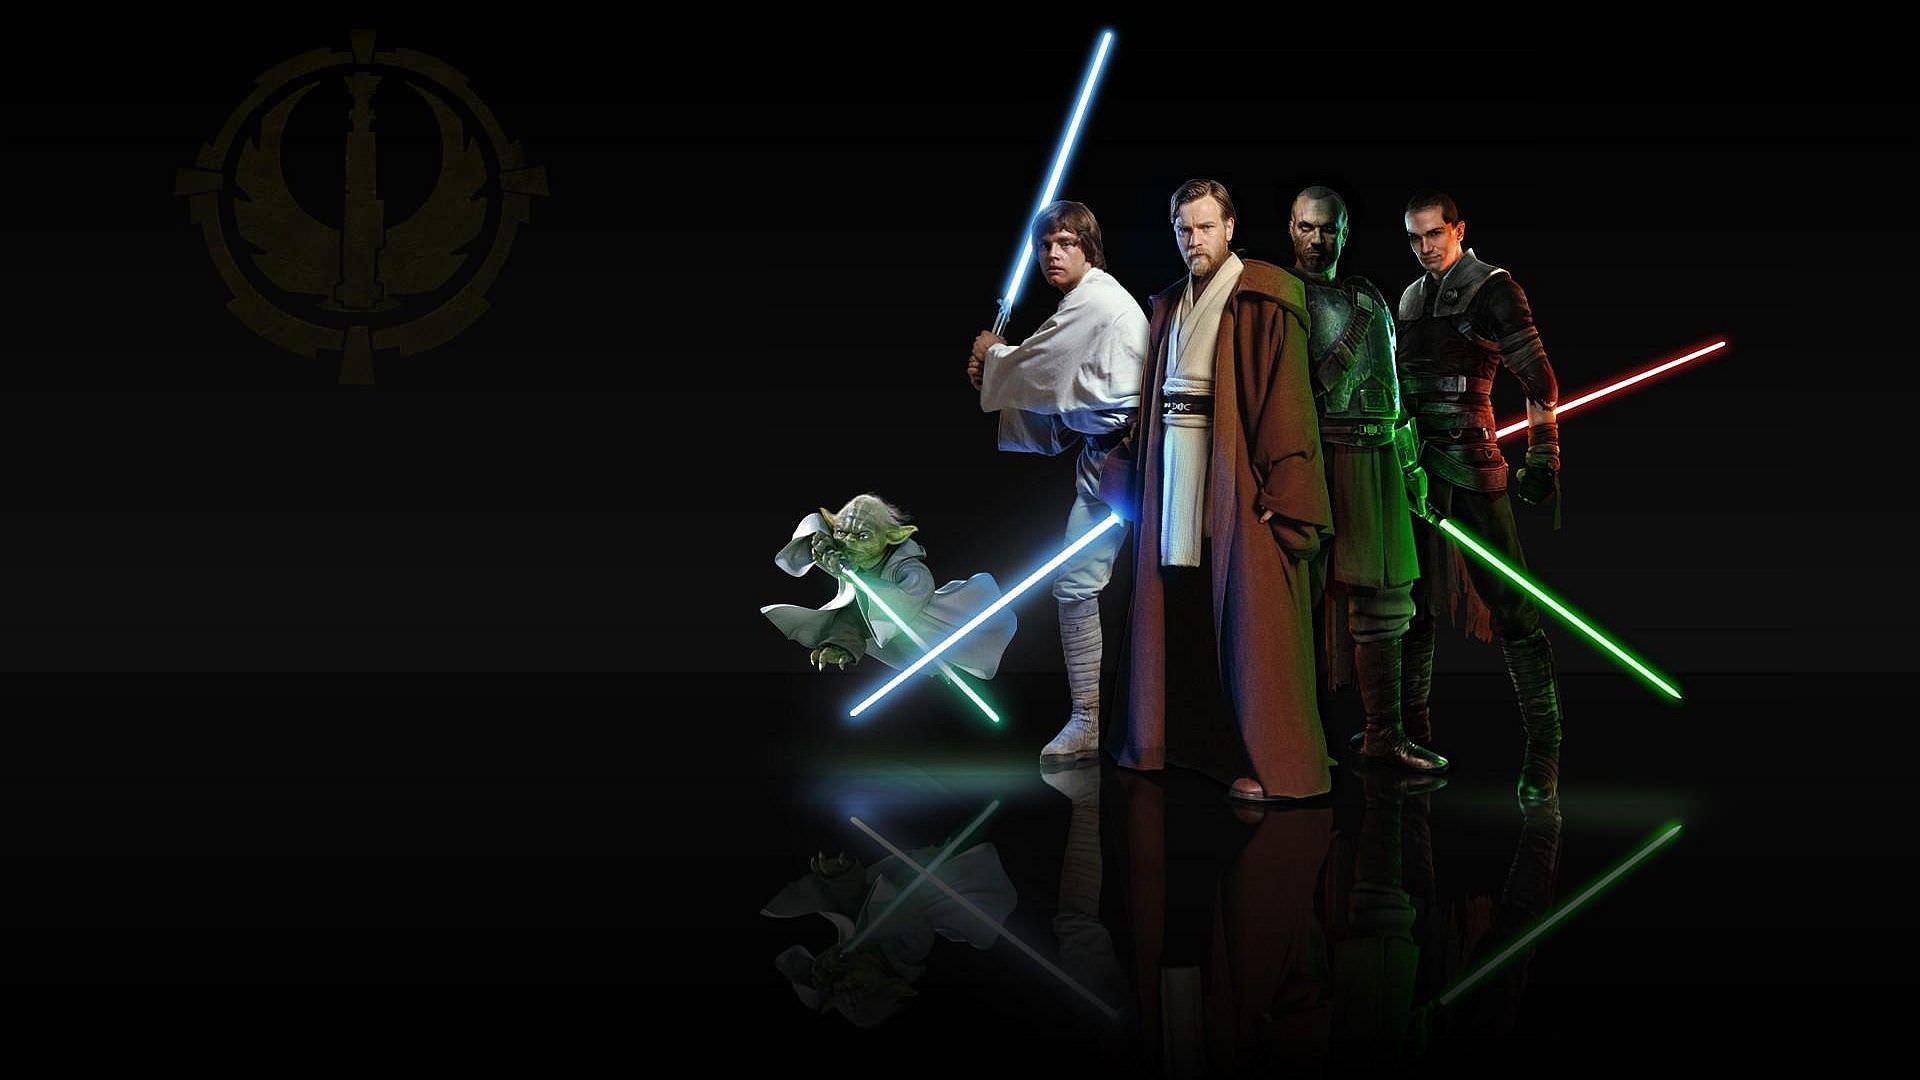 Star Wars Jedis Wallpaper For Free